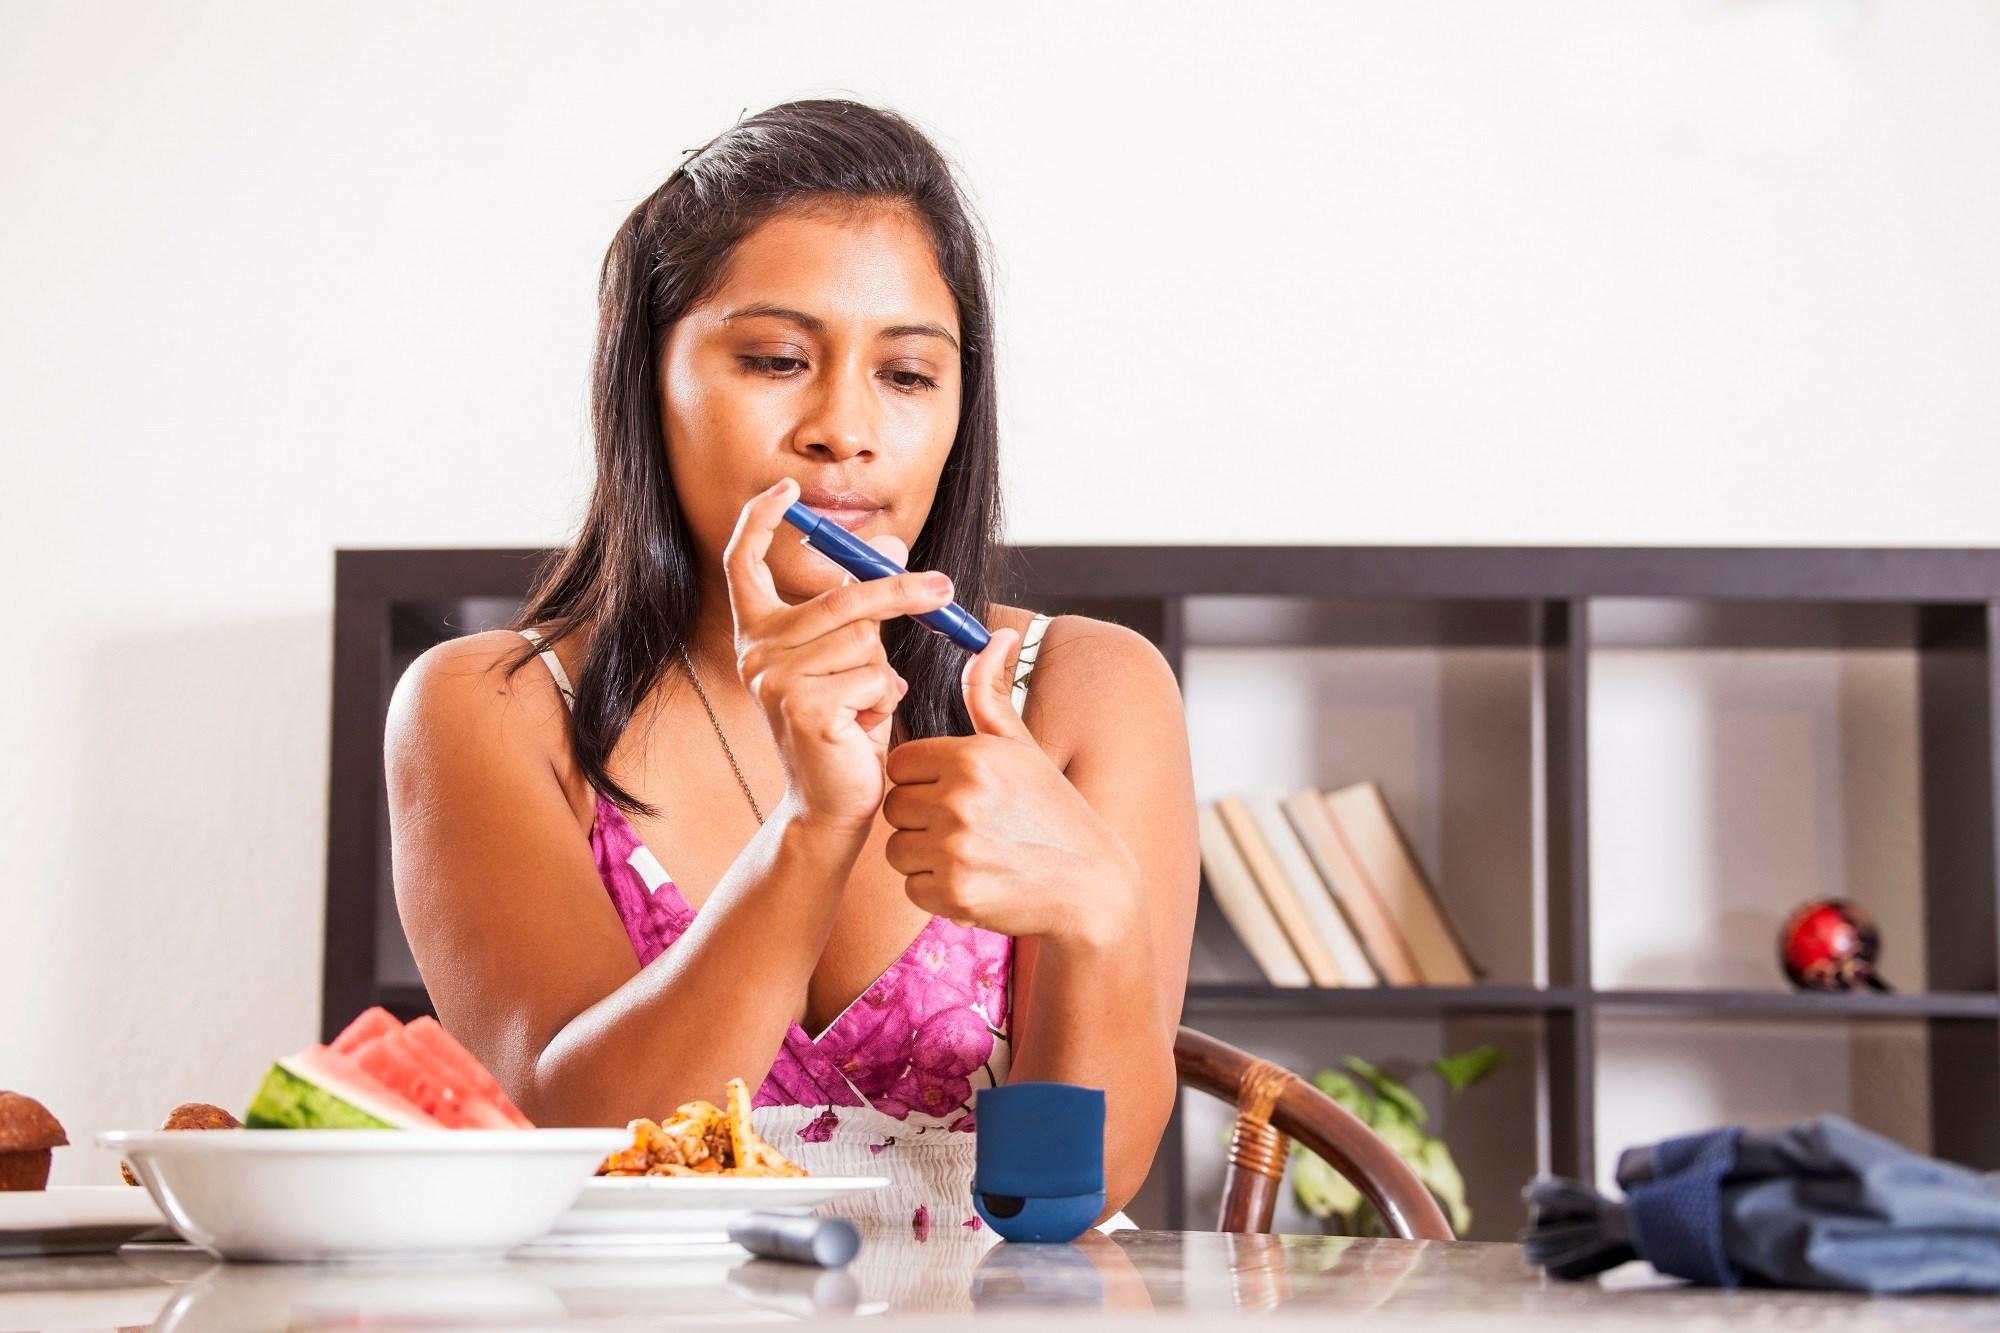 Gastric Banding vs Metformin for Improved Insulin Sensitivity in Mild T2D